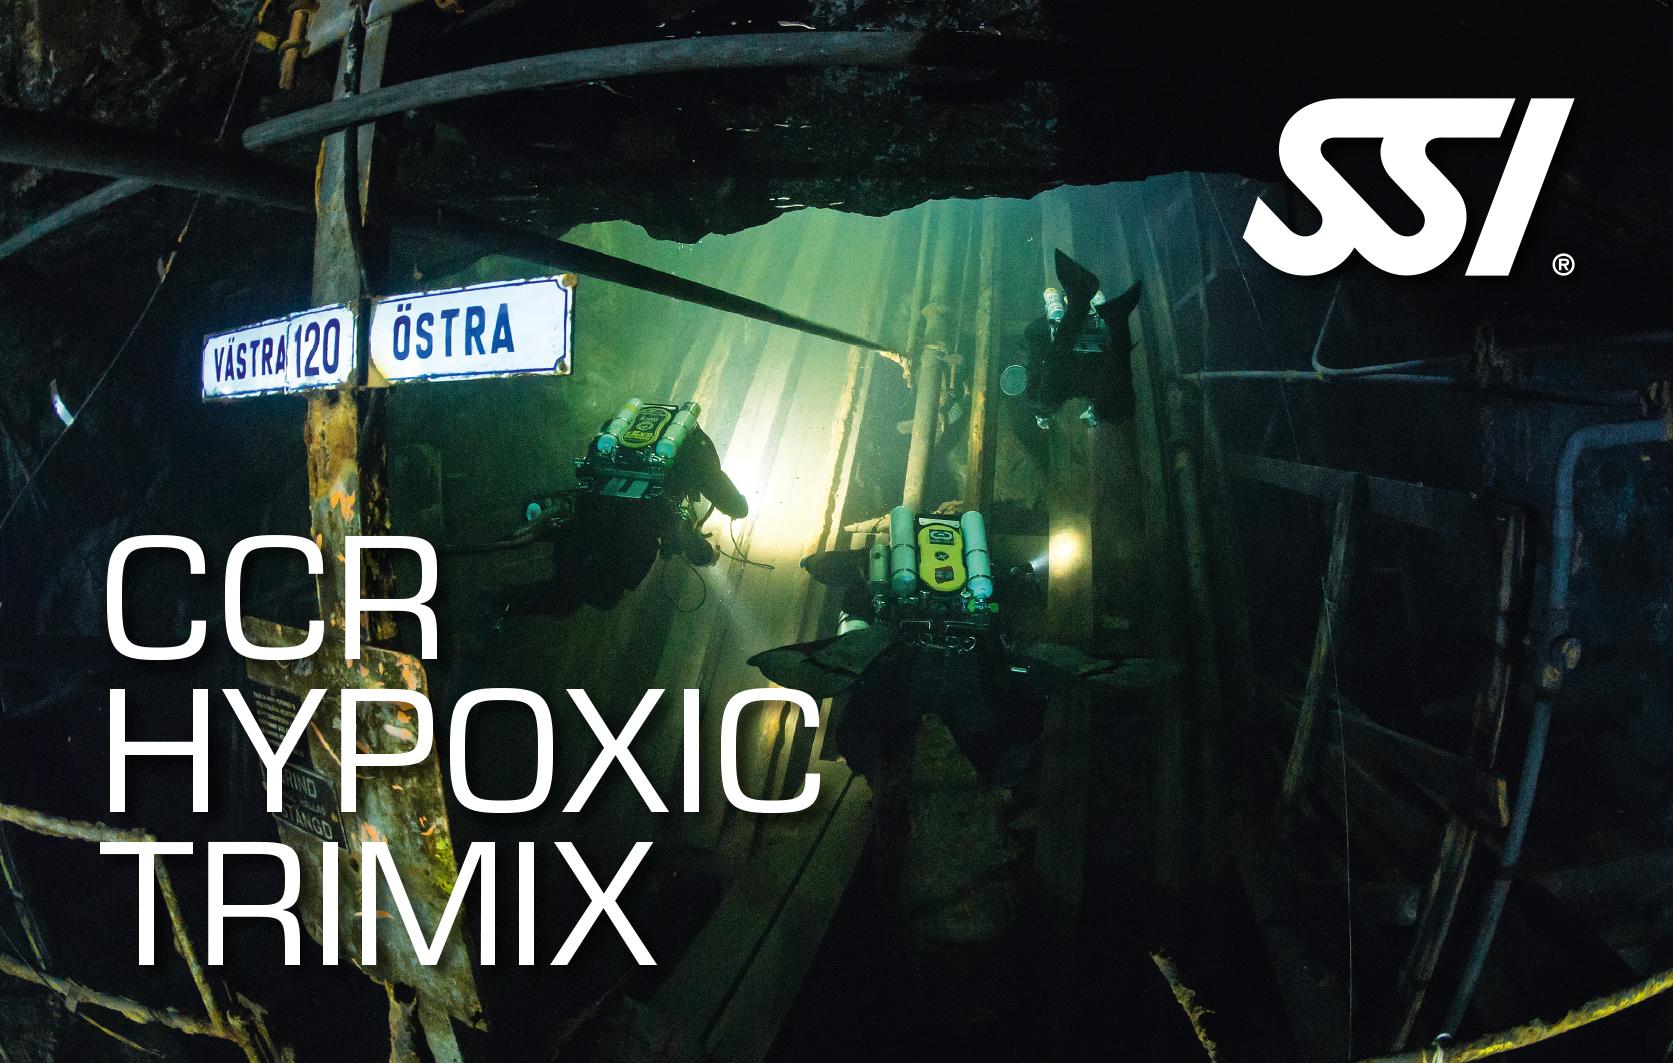 CCR Hypoxic Trimix